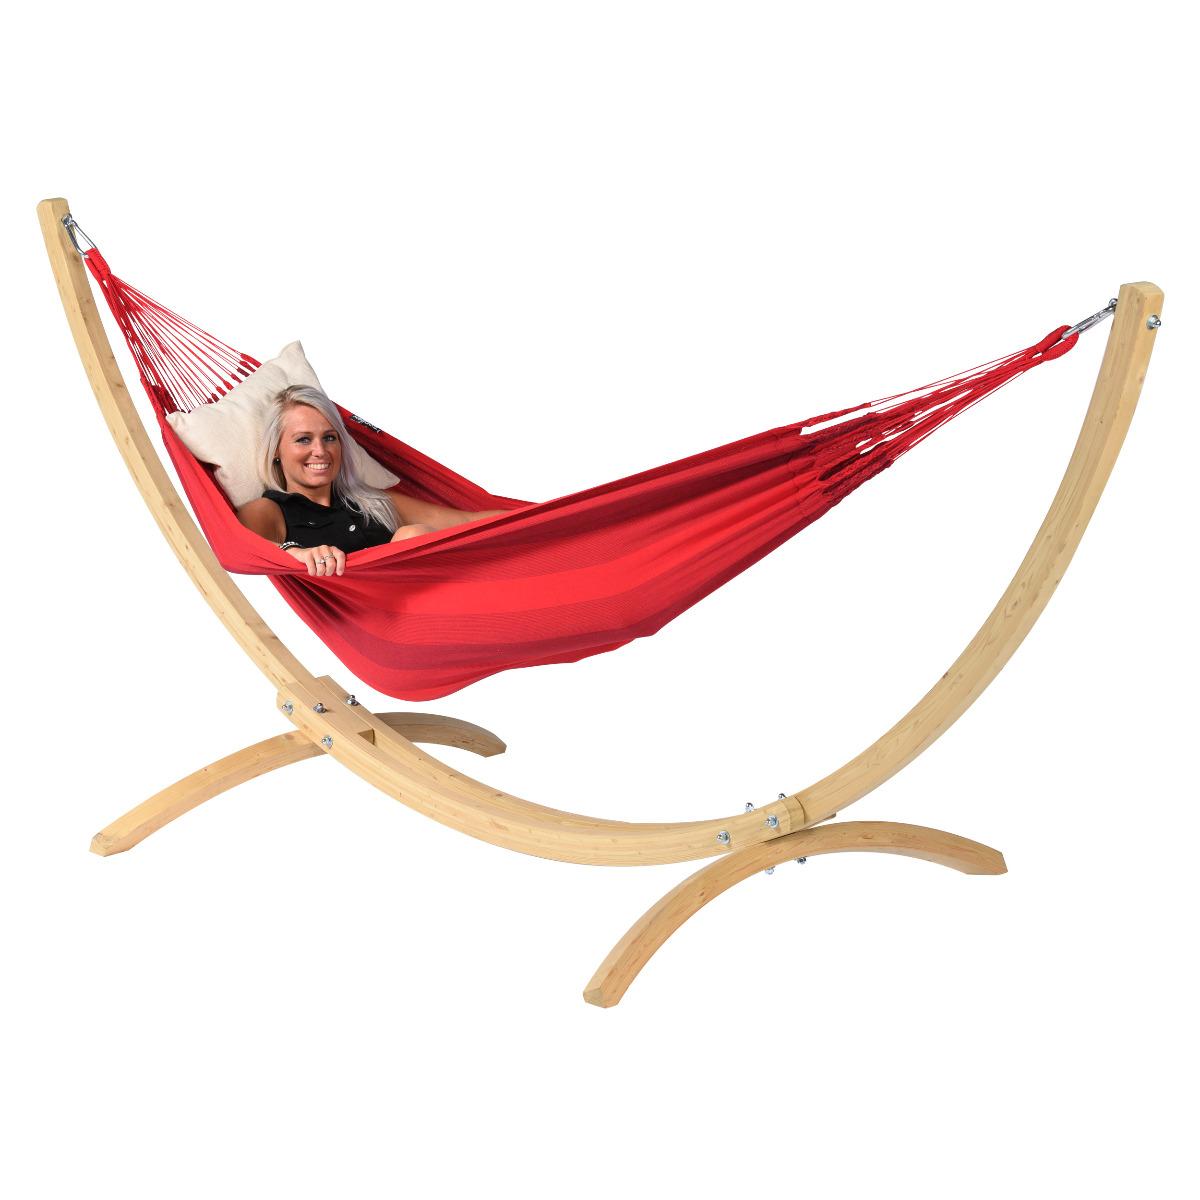 'Wood & Dream' Red E�npersoons Hangmatset - Rood - Tropilex �